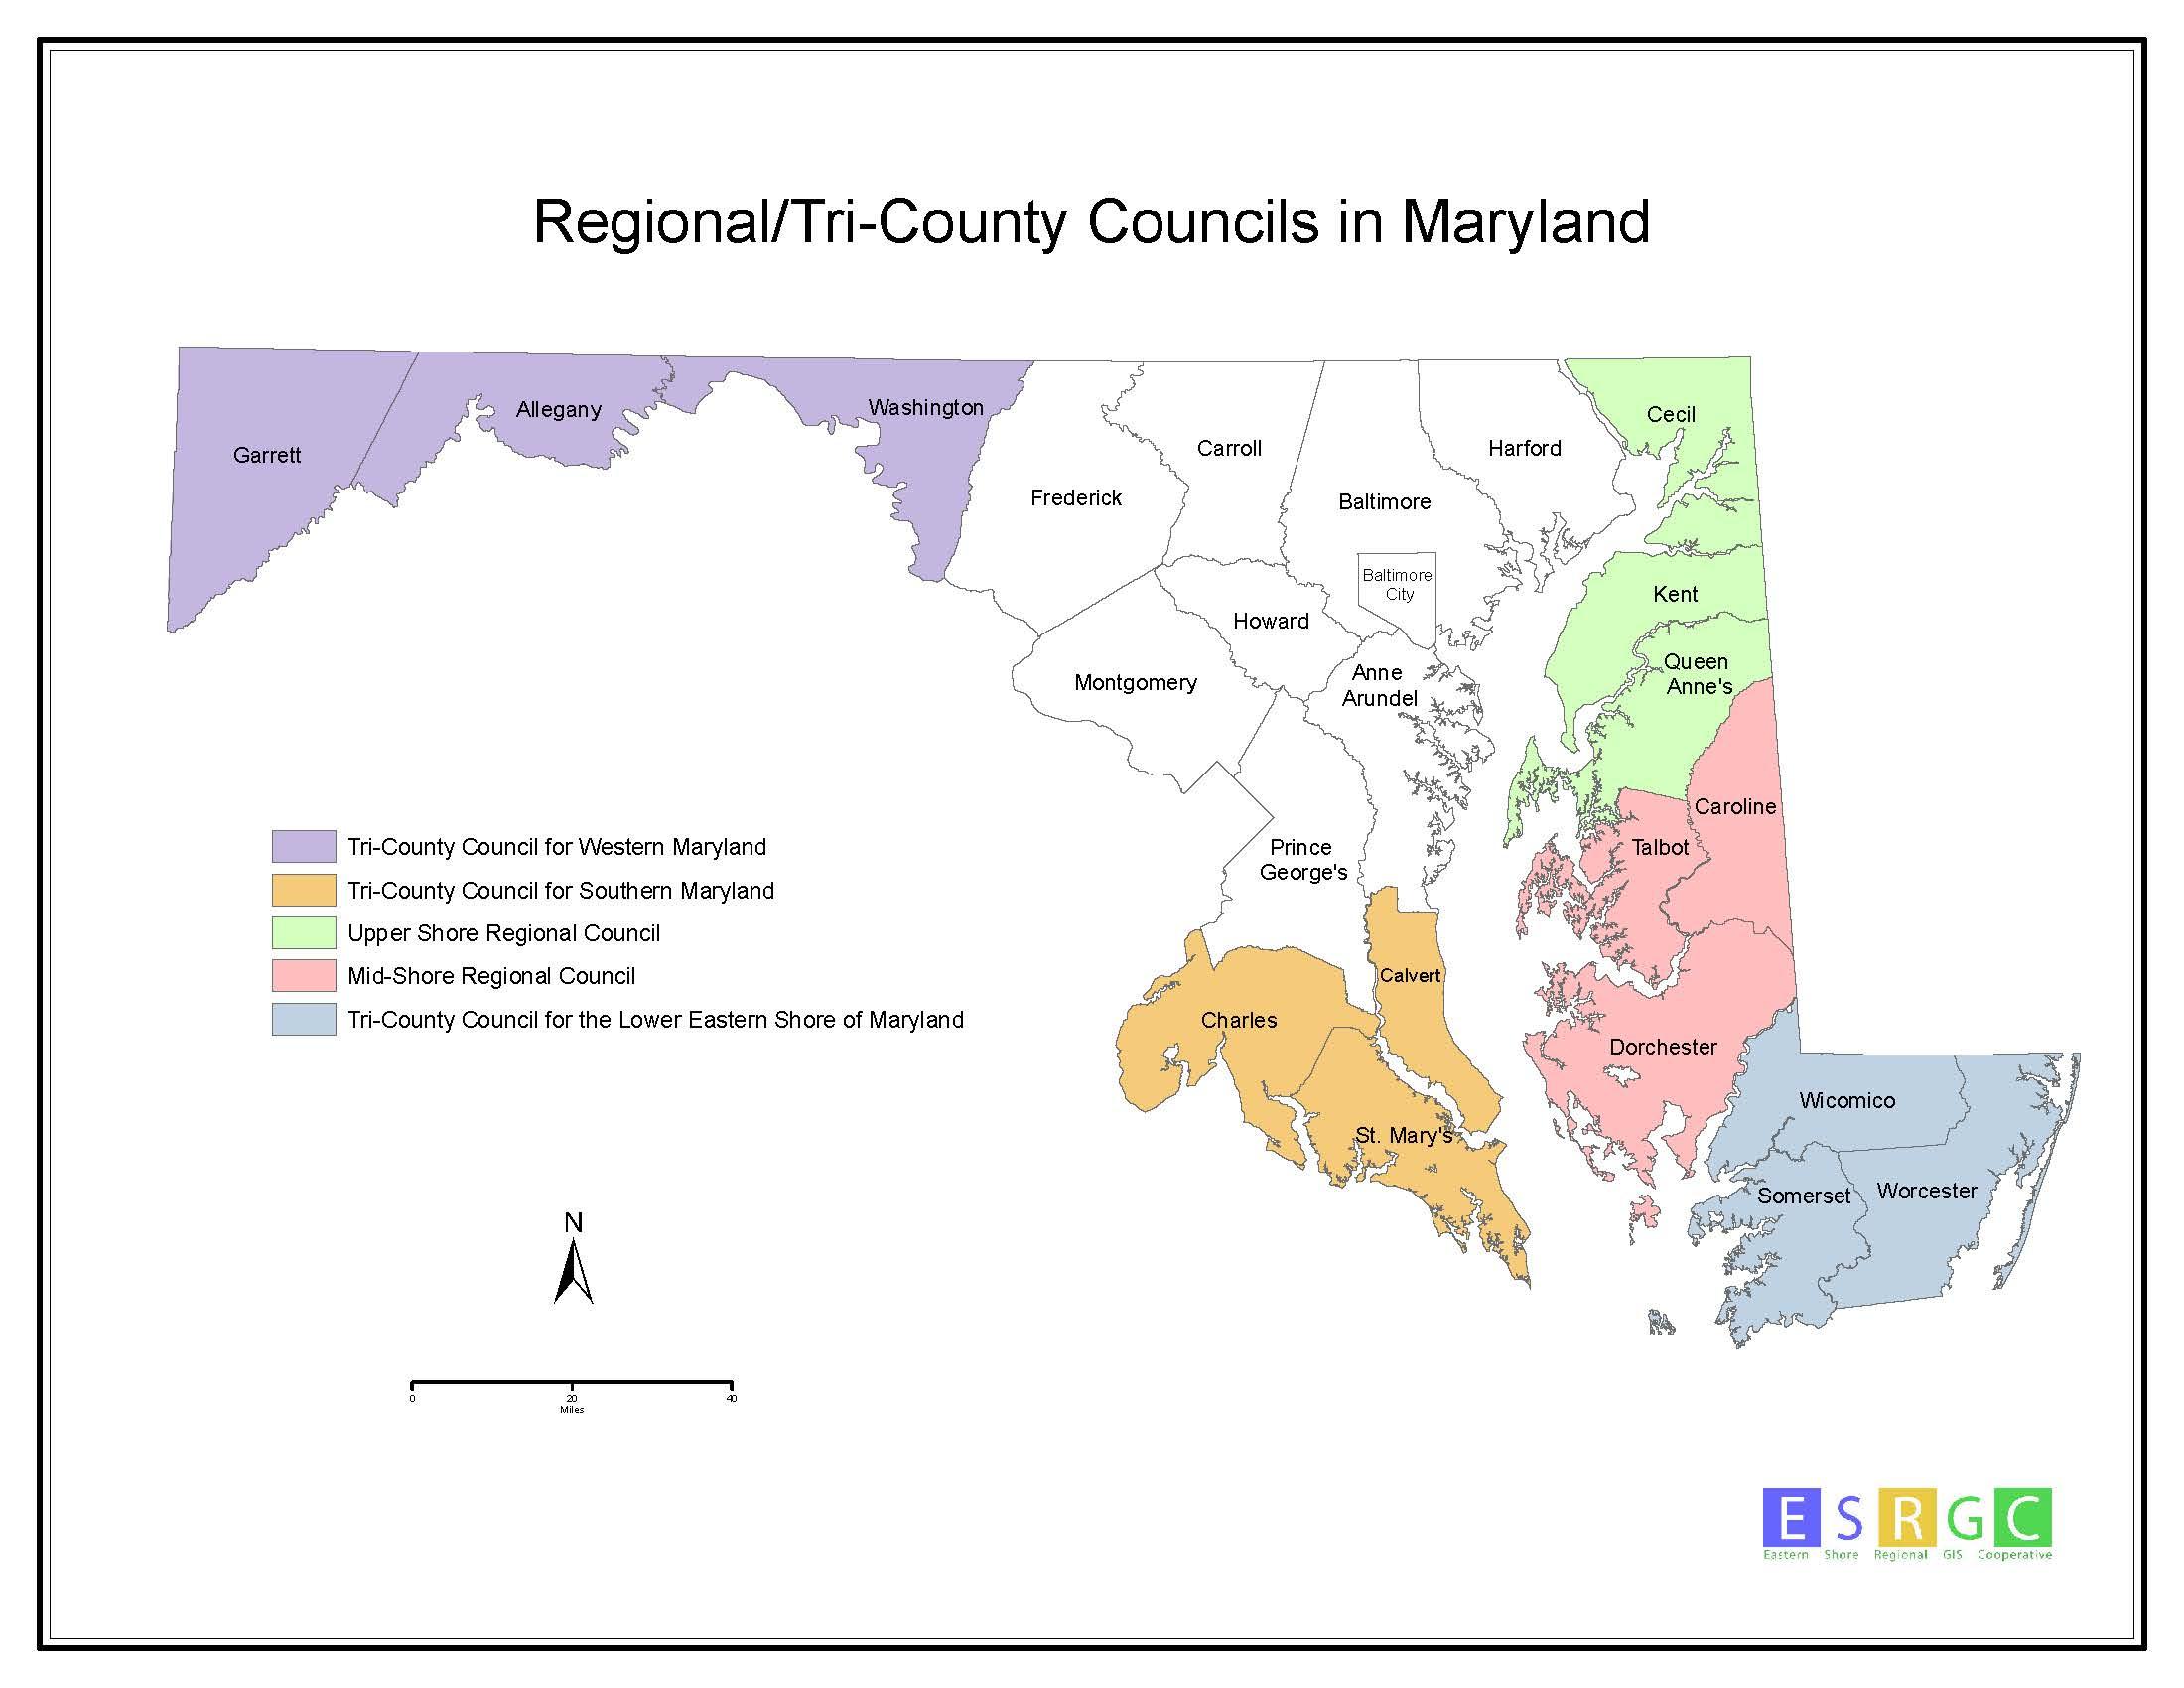 RegionalCouncilsMD